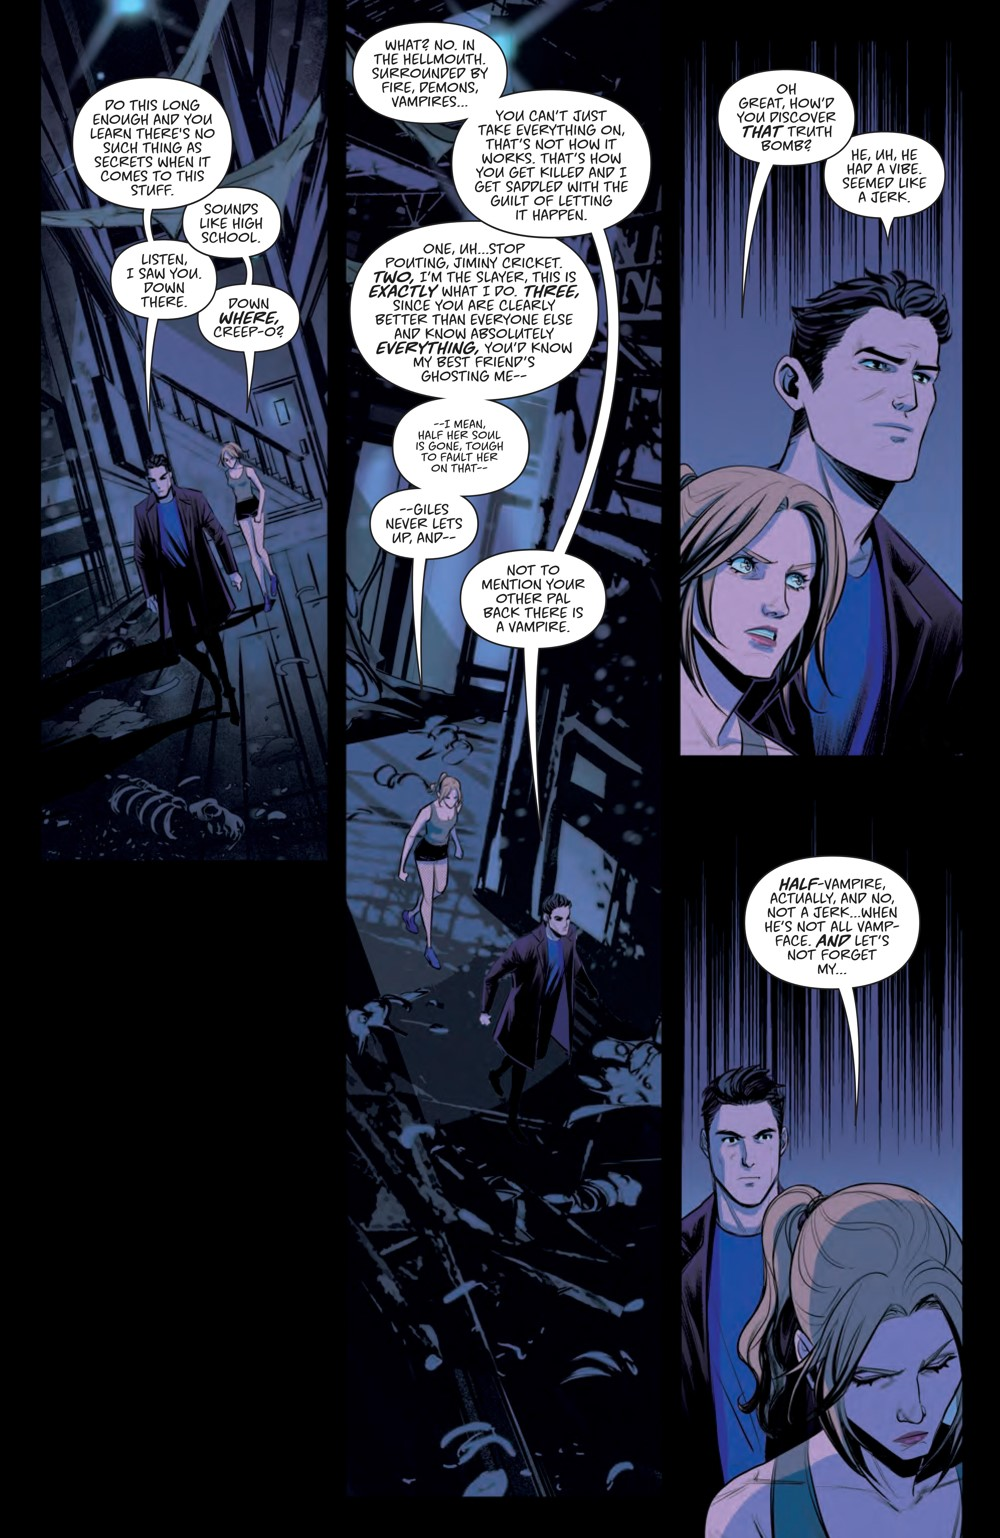 Hellmouth_SC_PRESS_20 ComicList Previews: BUFFY THE VAMPIRE SLAYER HELLMOUTH TP